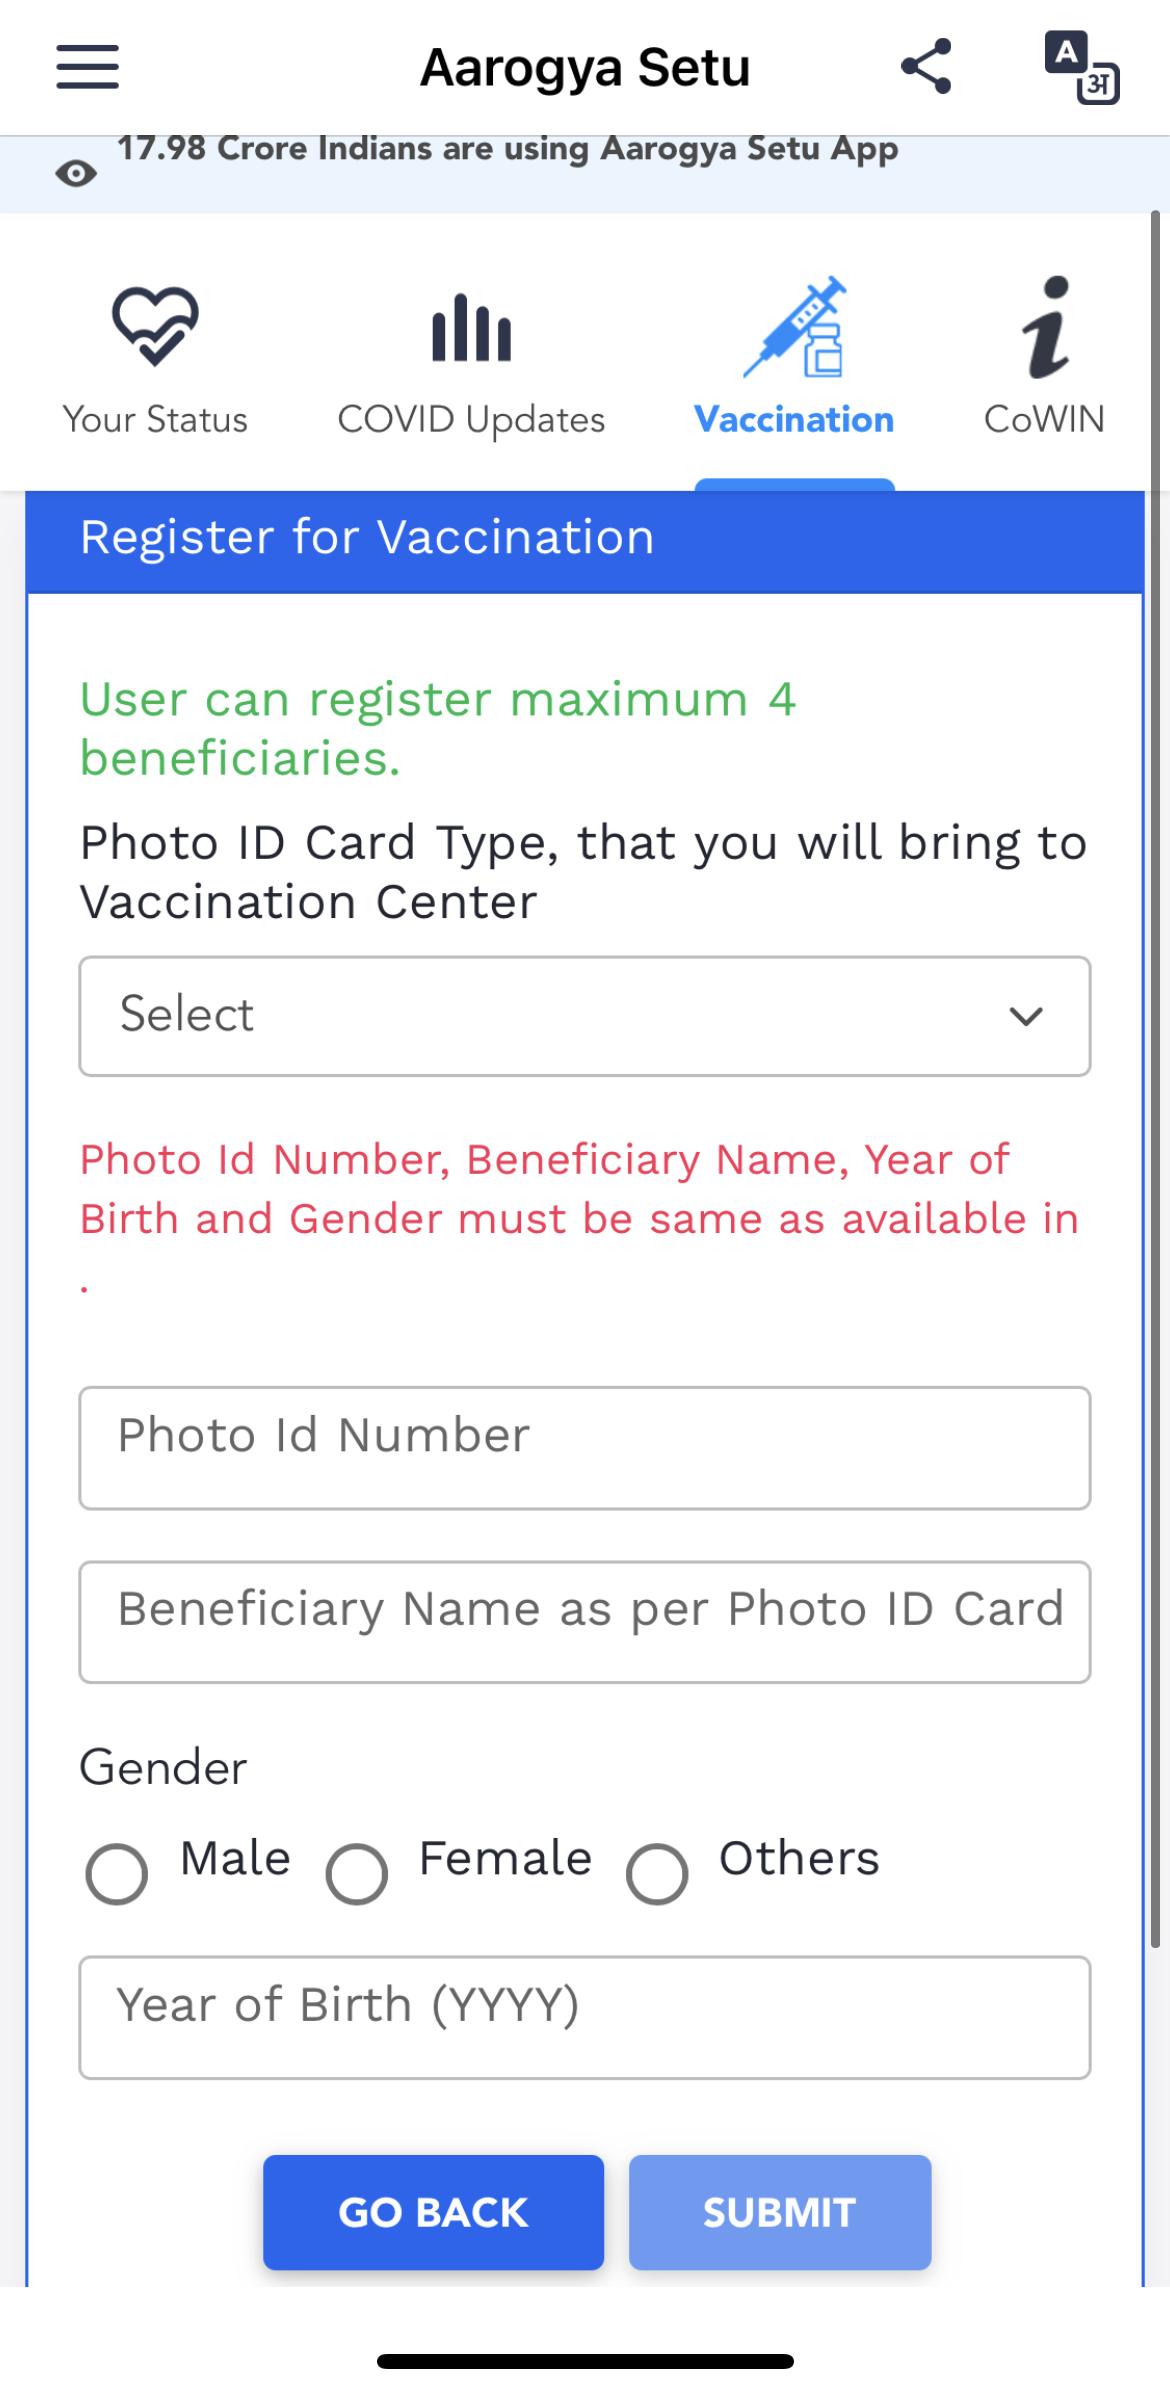 Arogya Setu Government India App Vaccination Registration